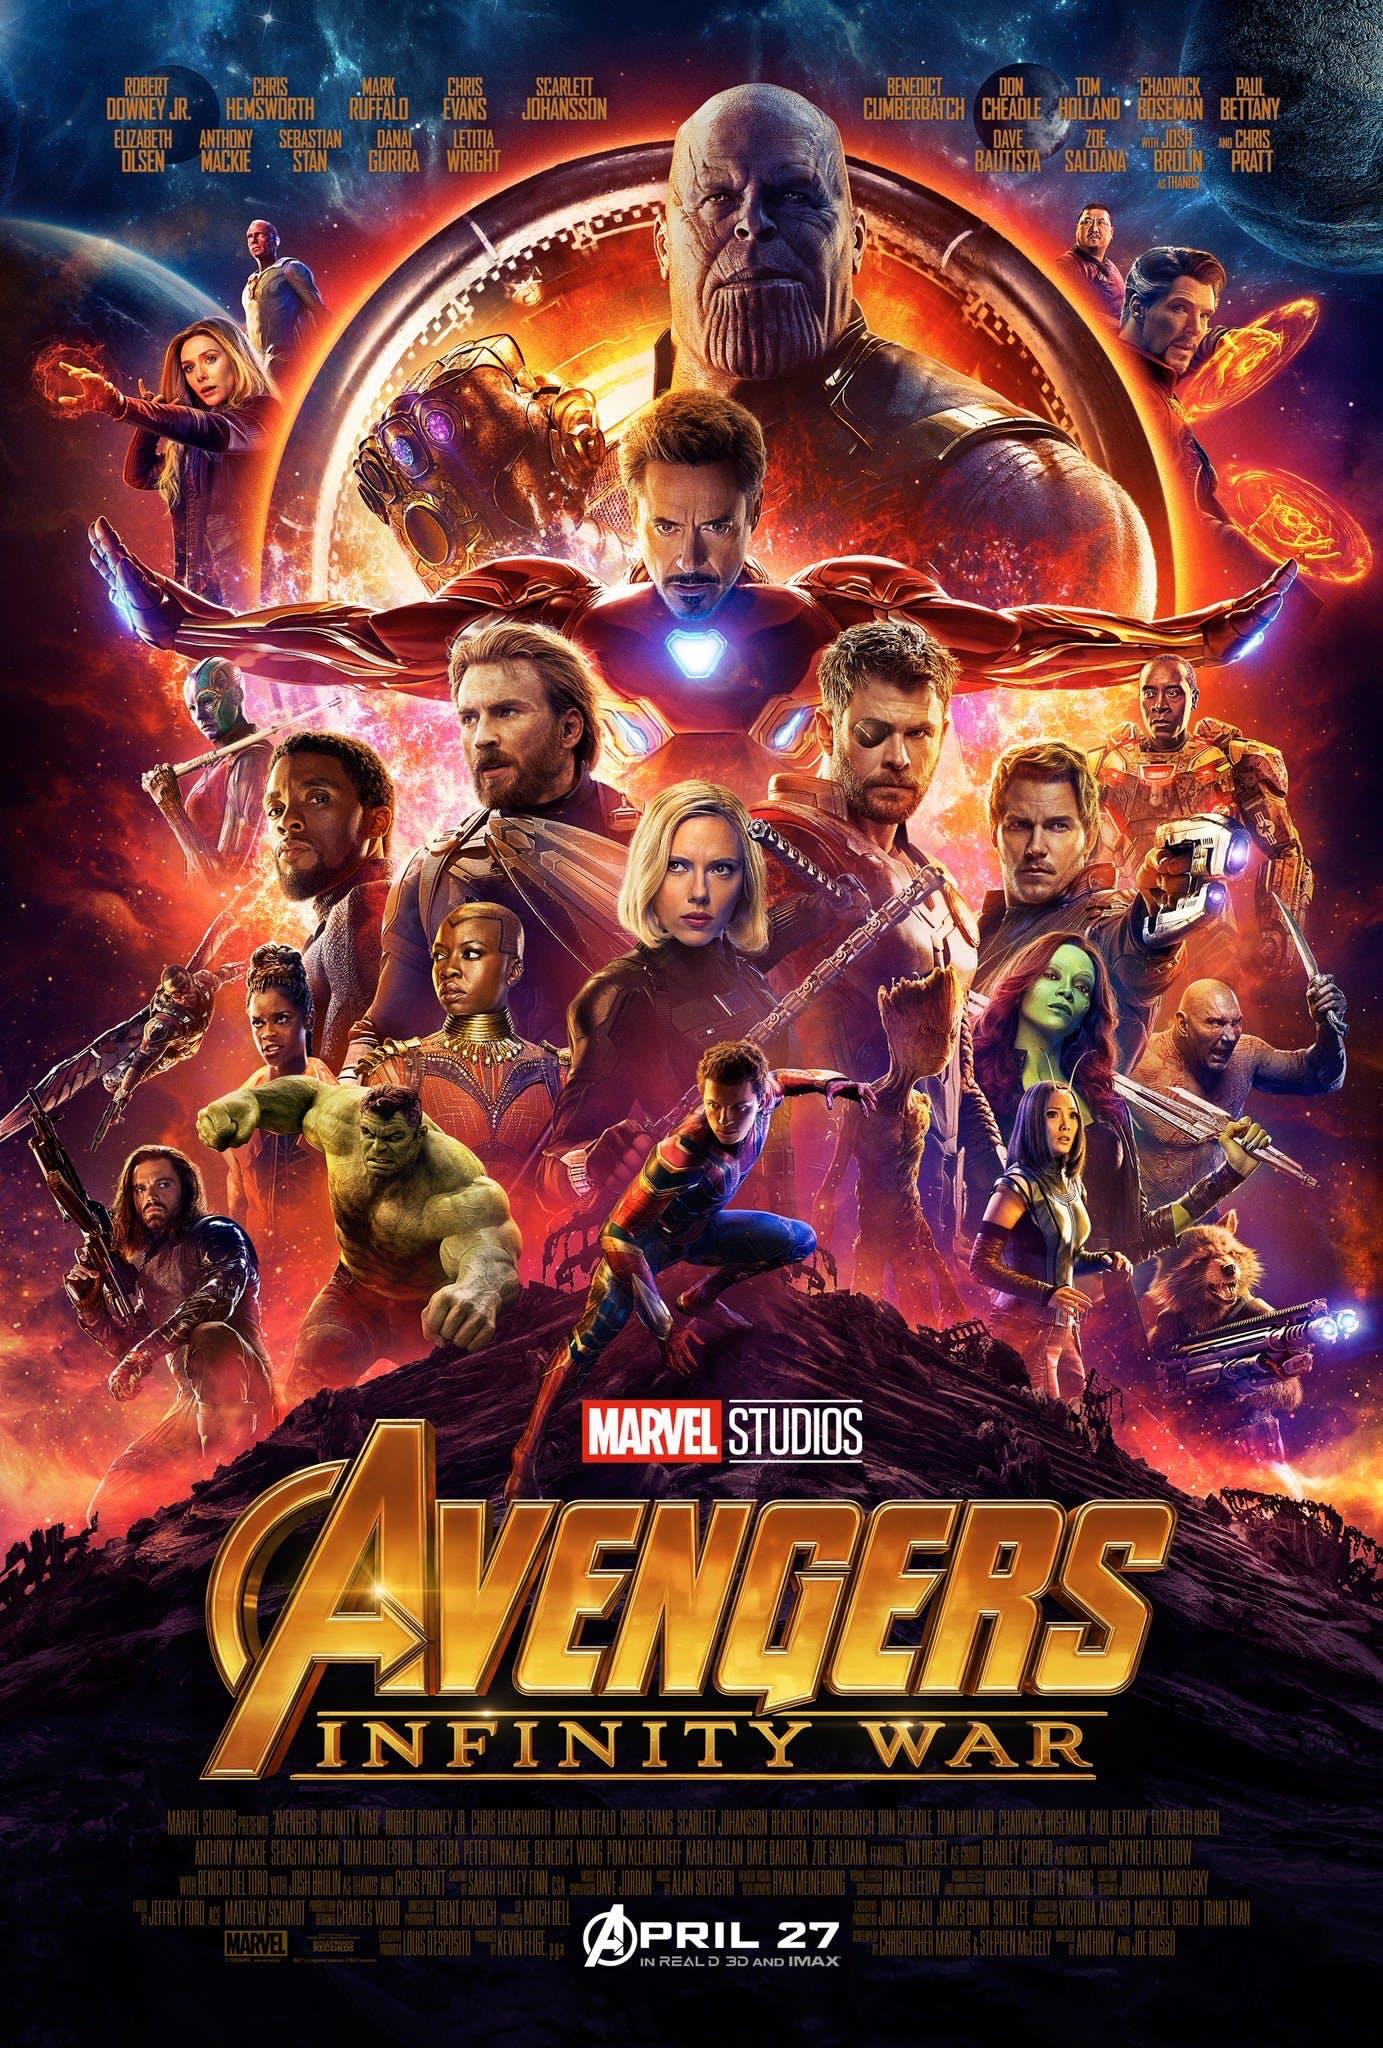 infinity-war-poster-new